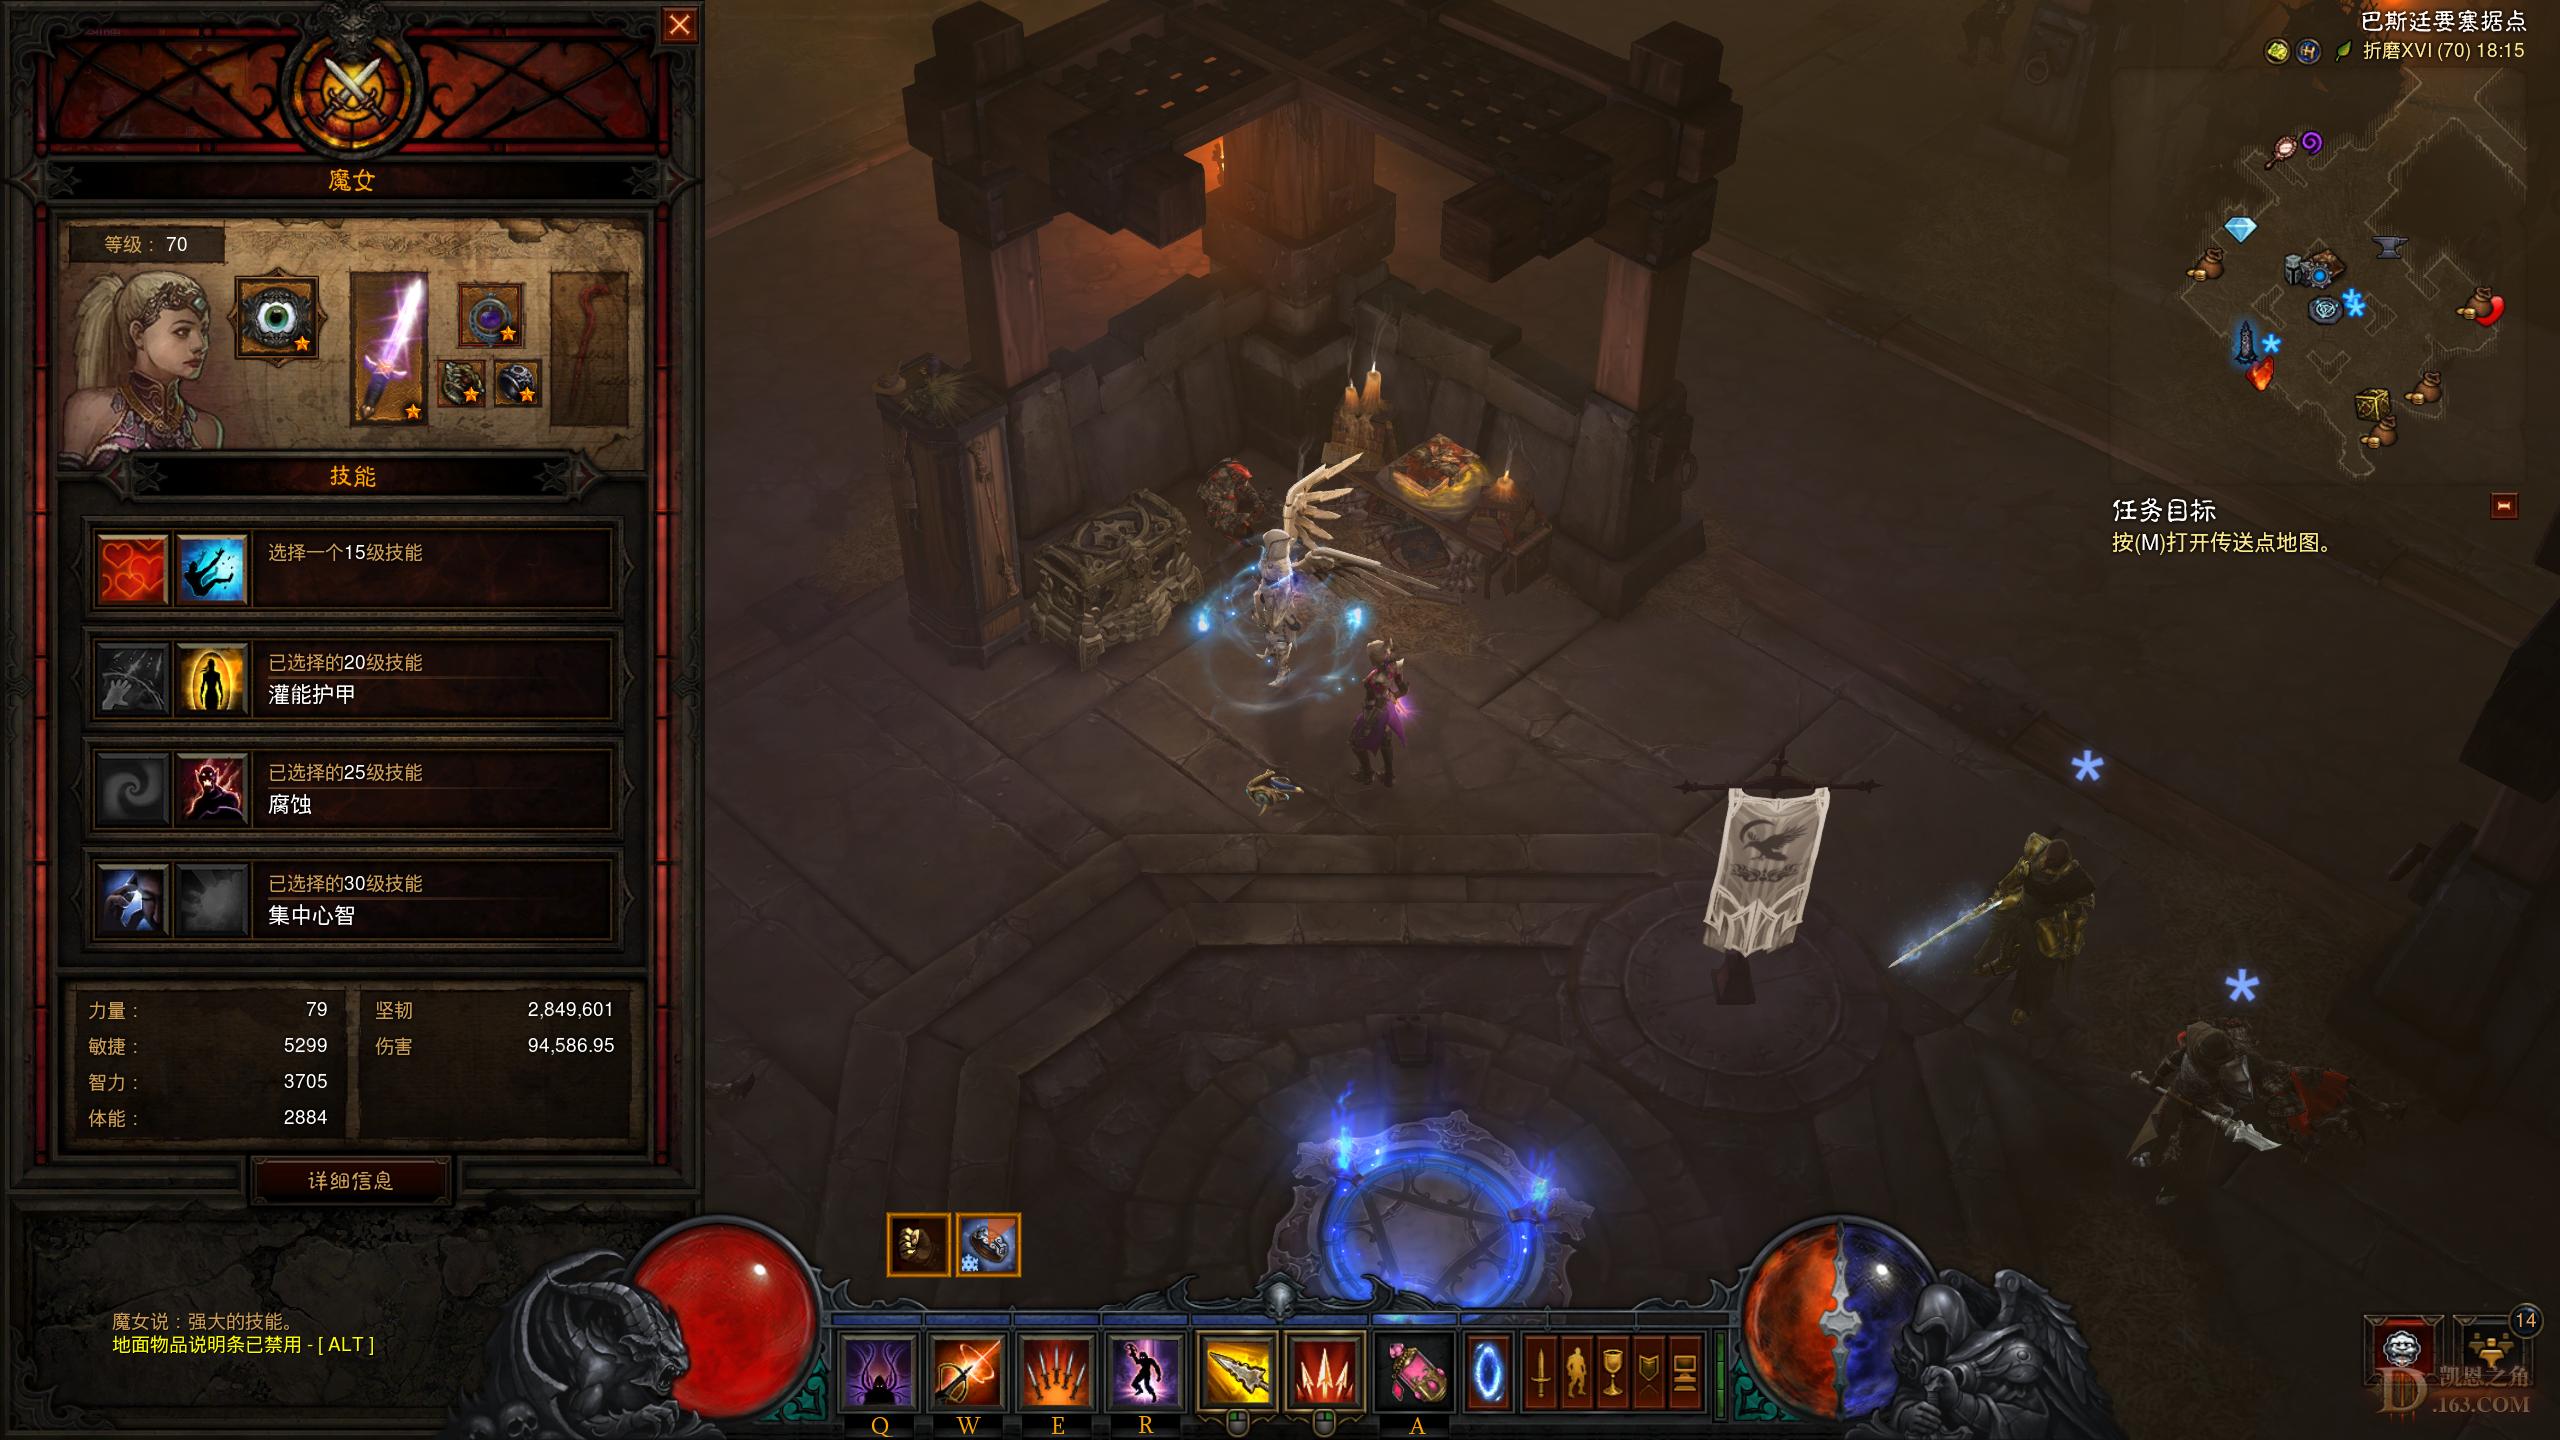 Diablo III Screenshot 2020.11.07 - 18.15.22.74.png